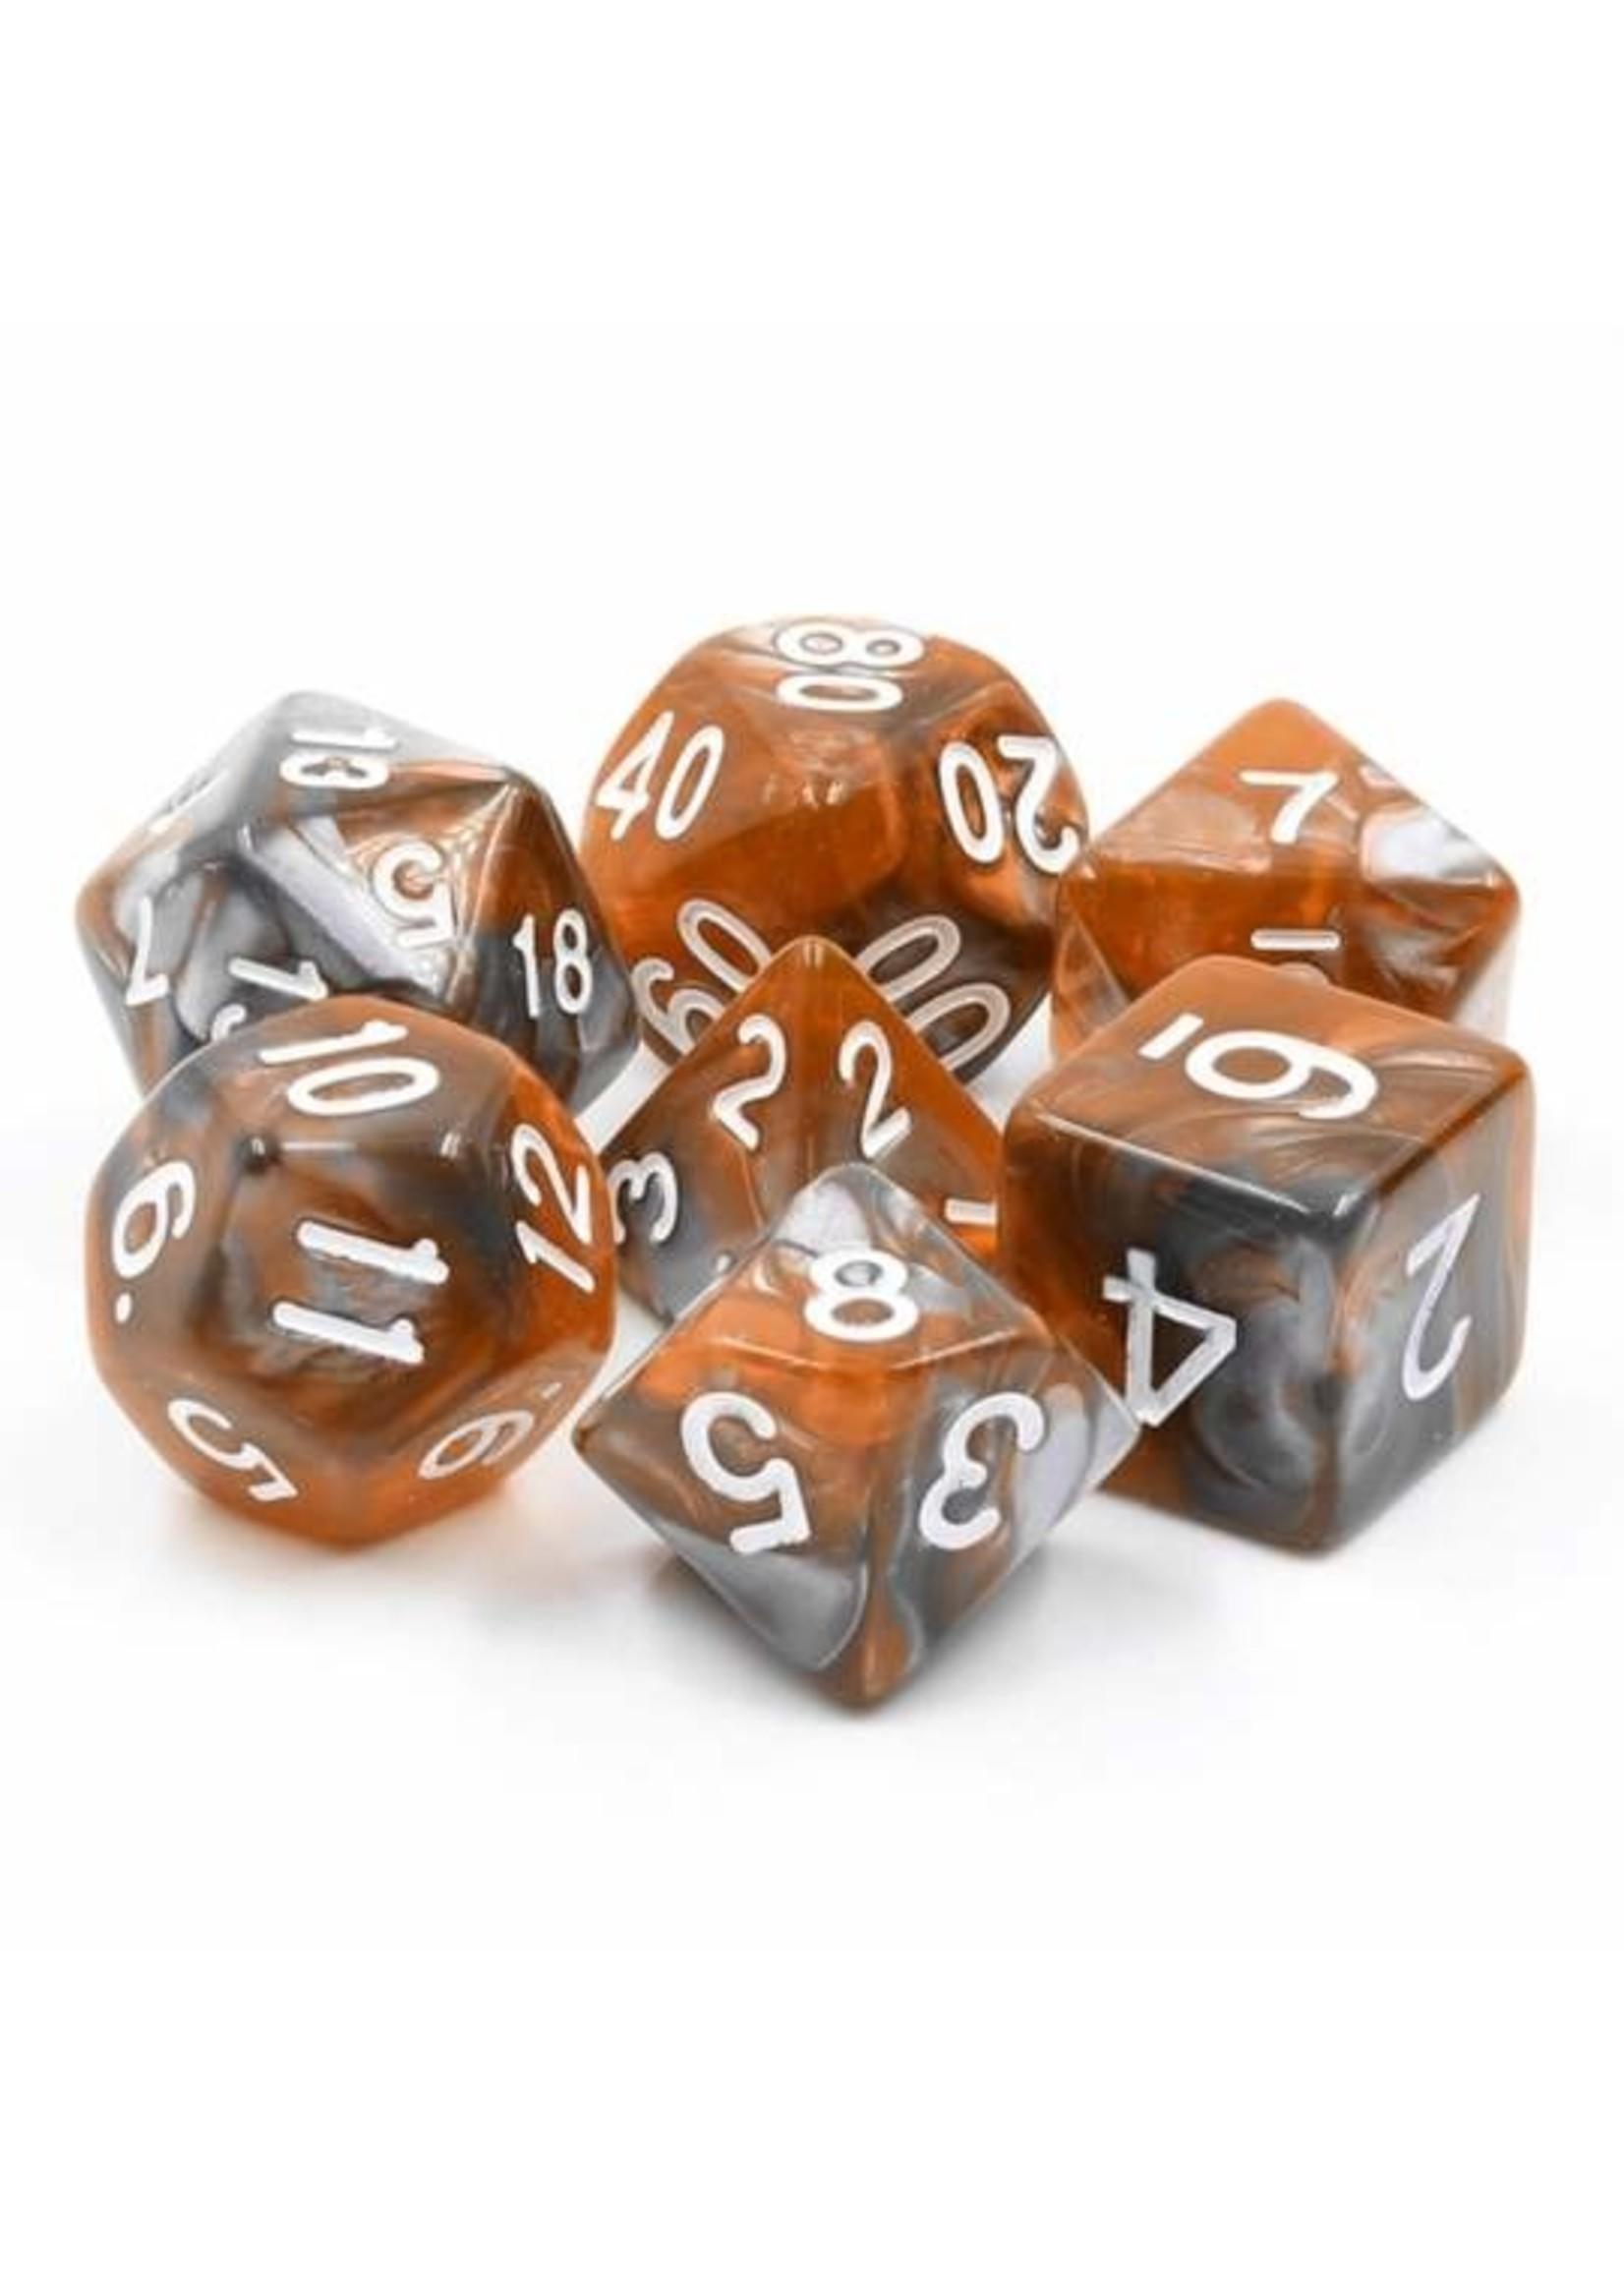 Amber Shard RPG Dice Set